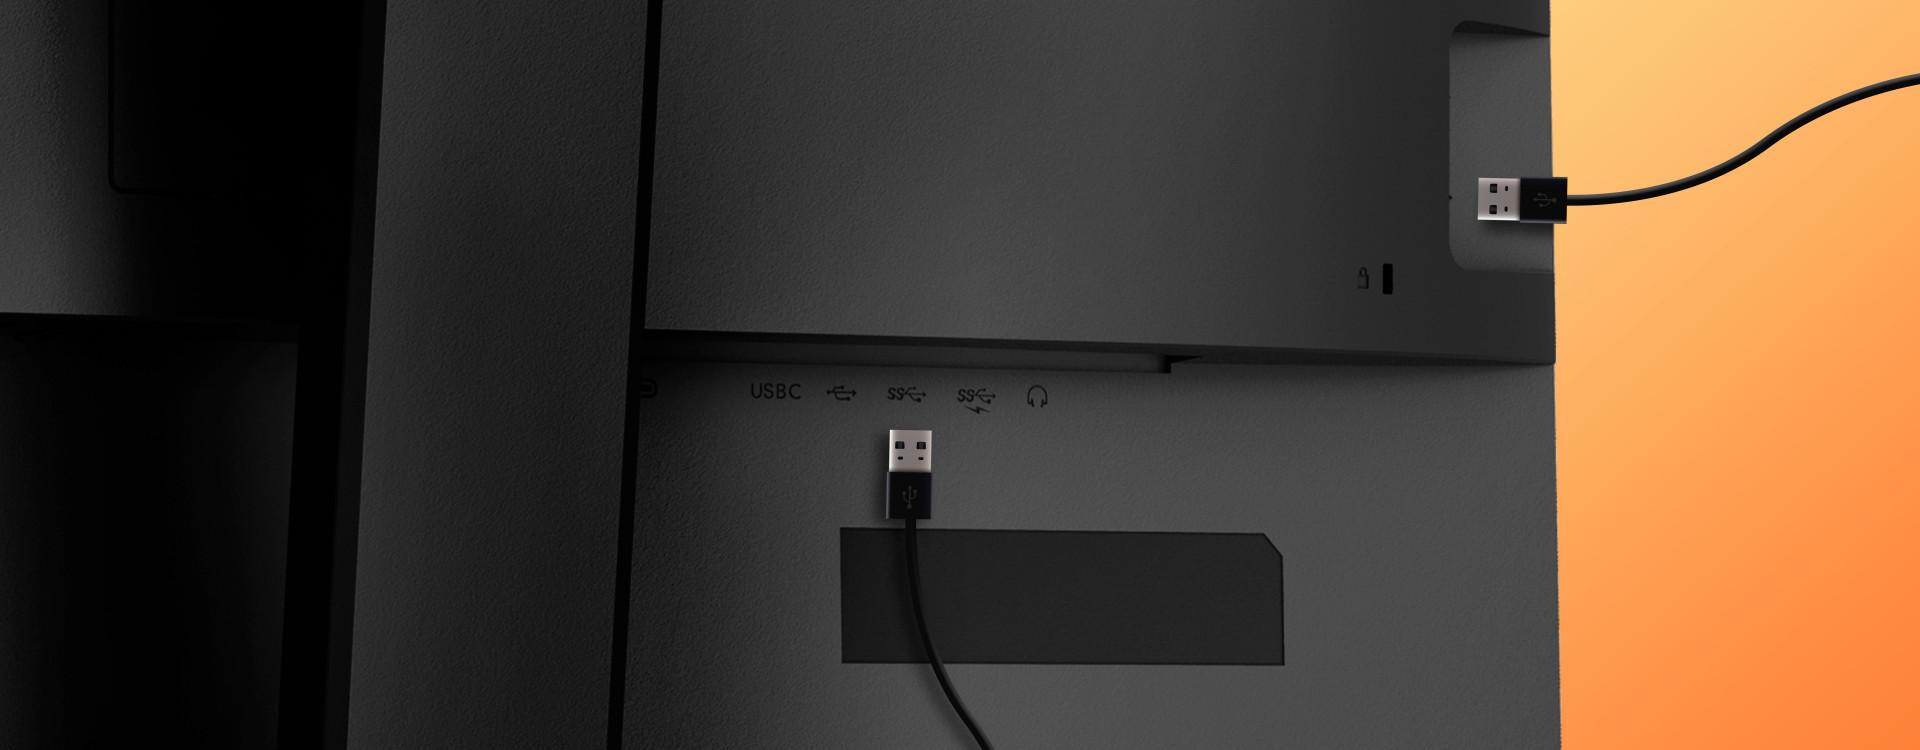 AOC_B2B_C_U32P2_USB_HUB.jpg